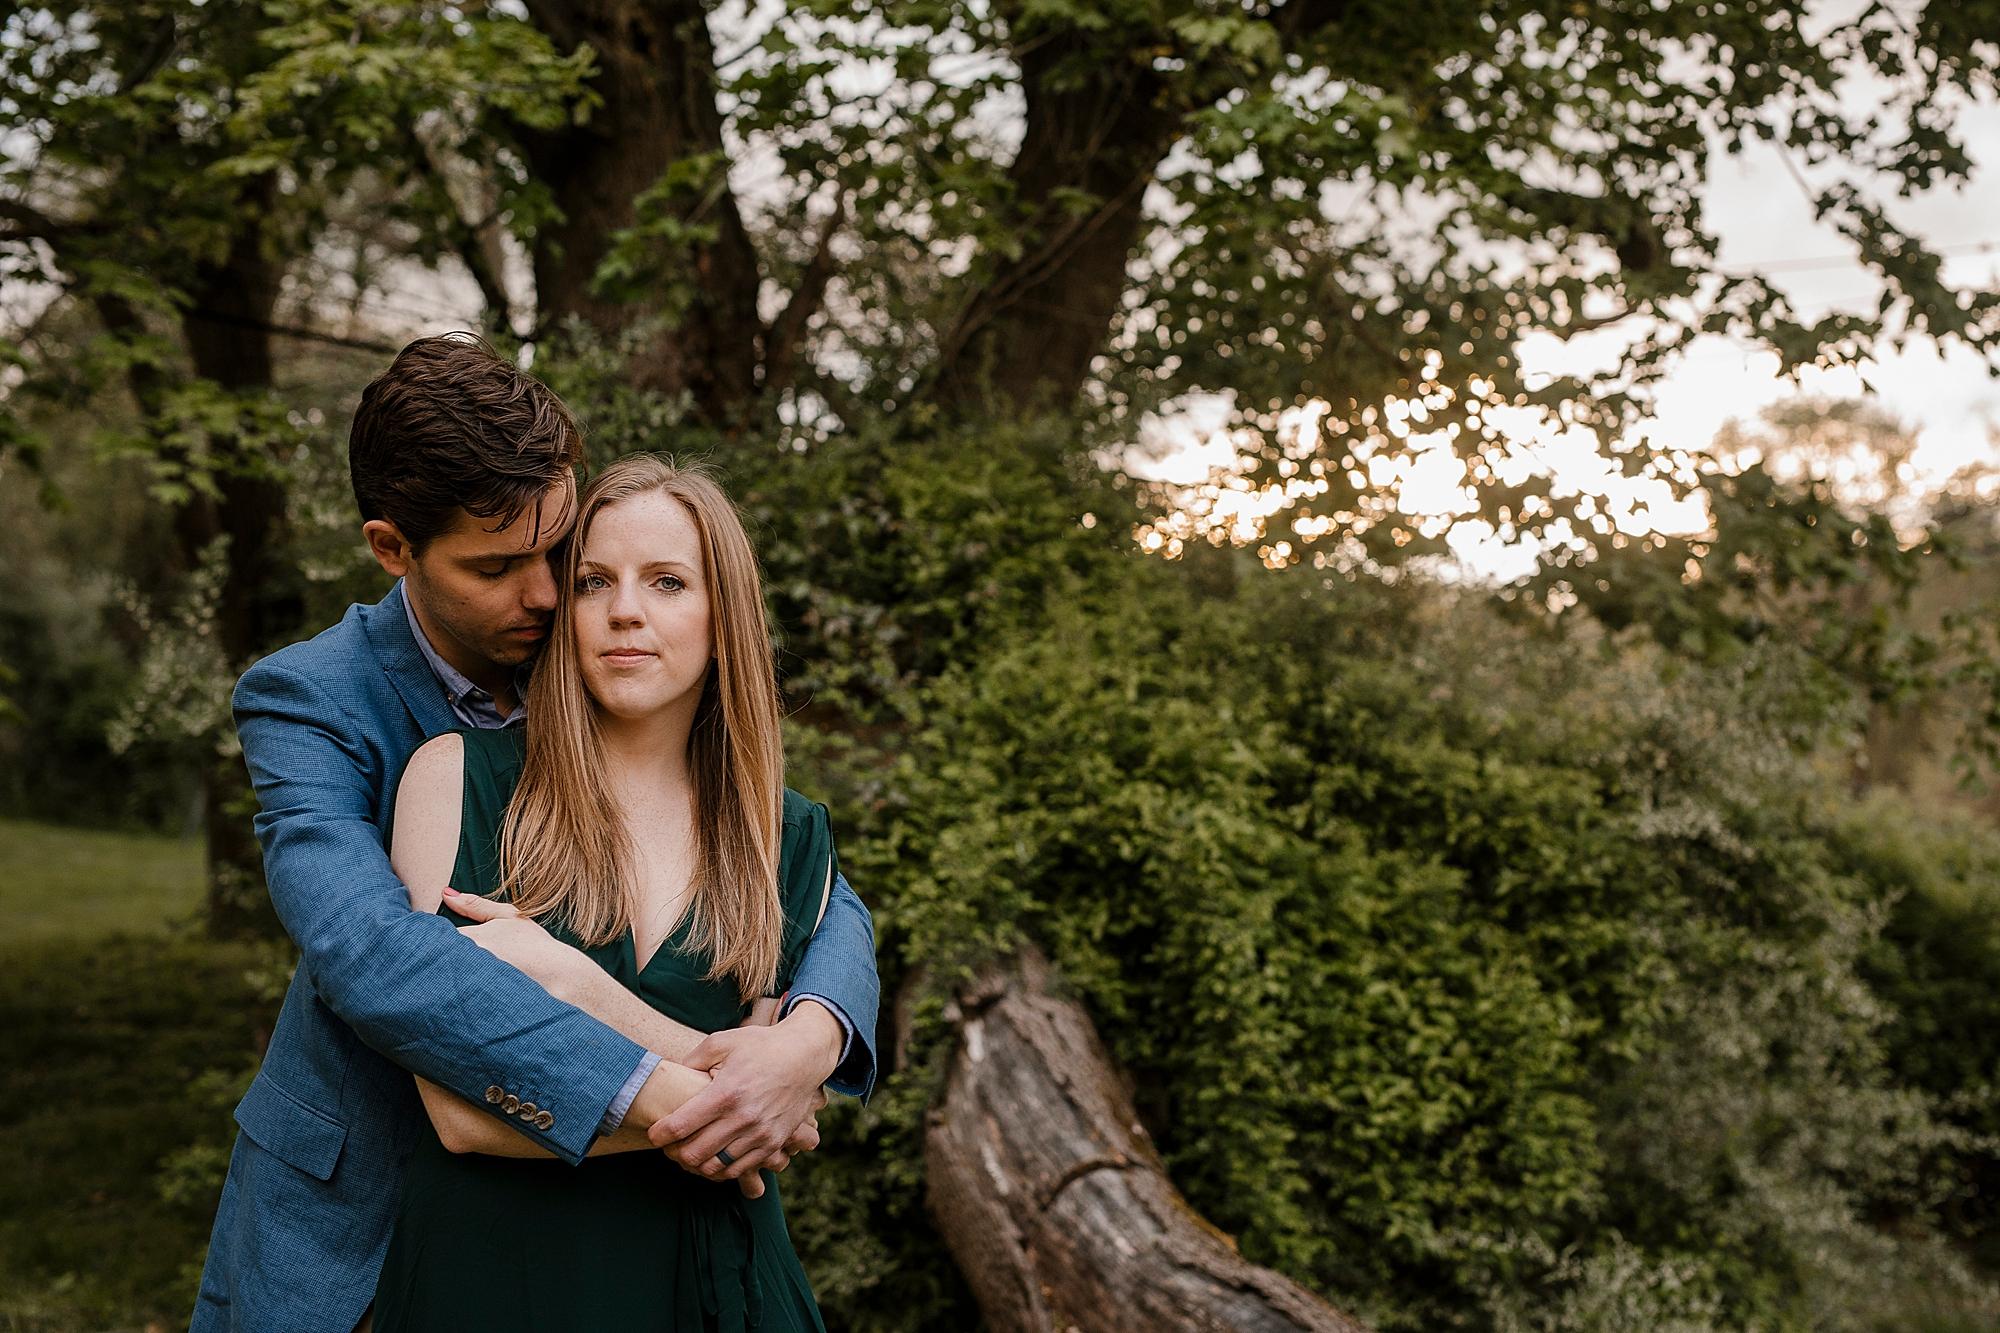 Tori_Zack_Glen_Mills_Terrain Cafe_Wedding_Engagement_Photography_Joe_Mac_Creative__0040.jpg